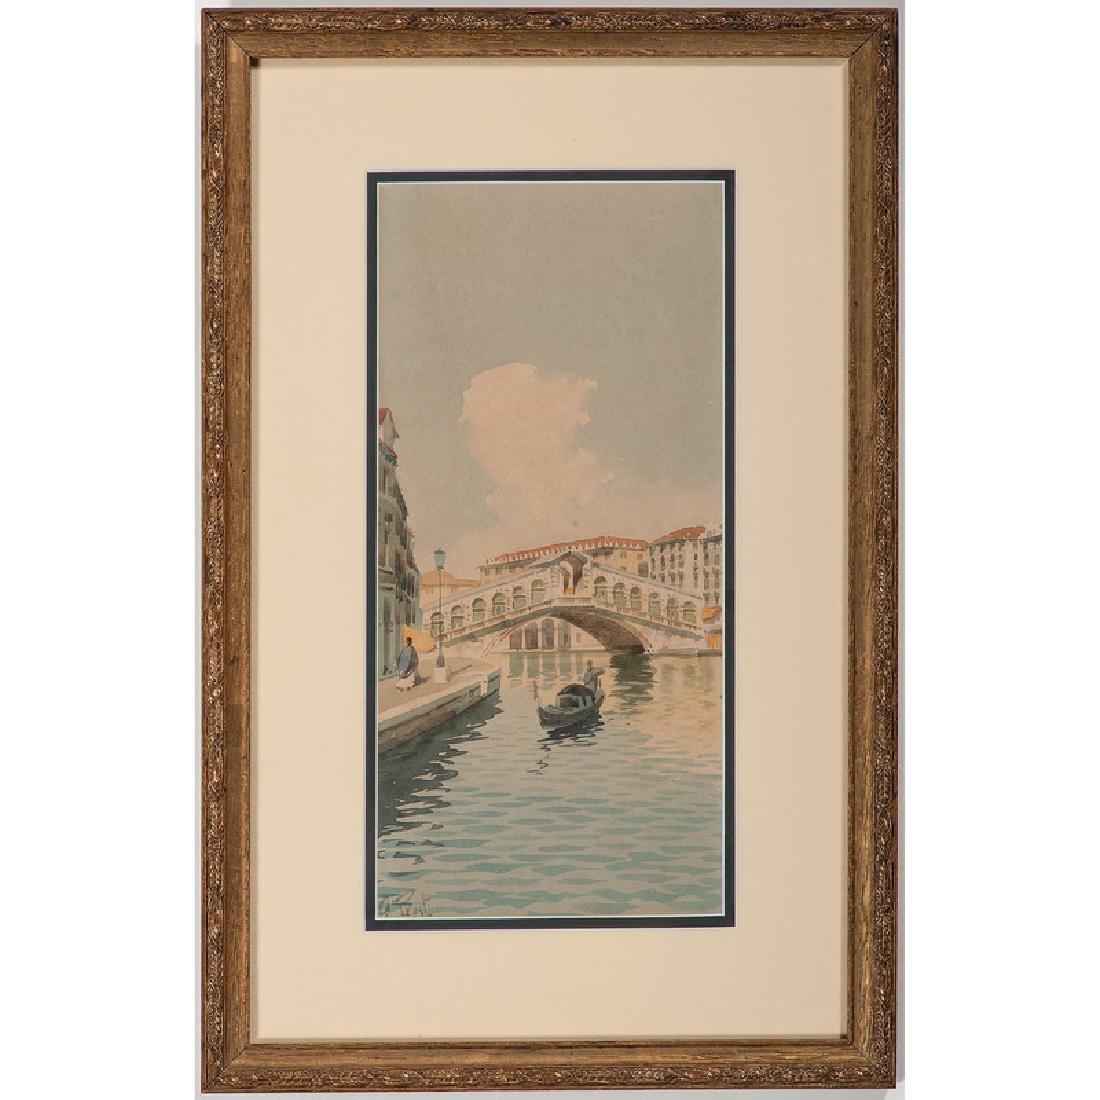 A. Presti (Italian, 20th century)